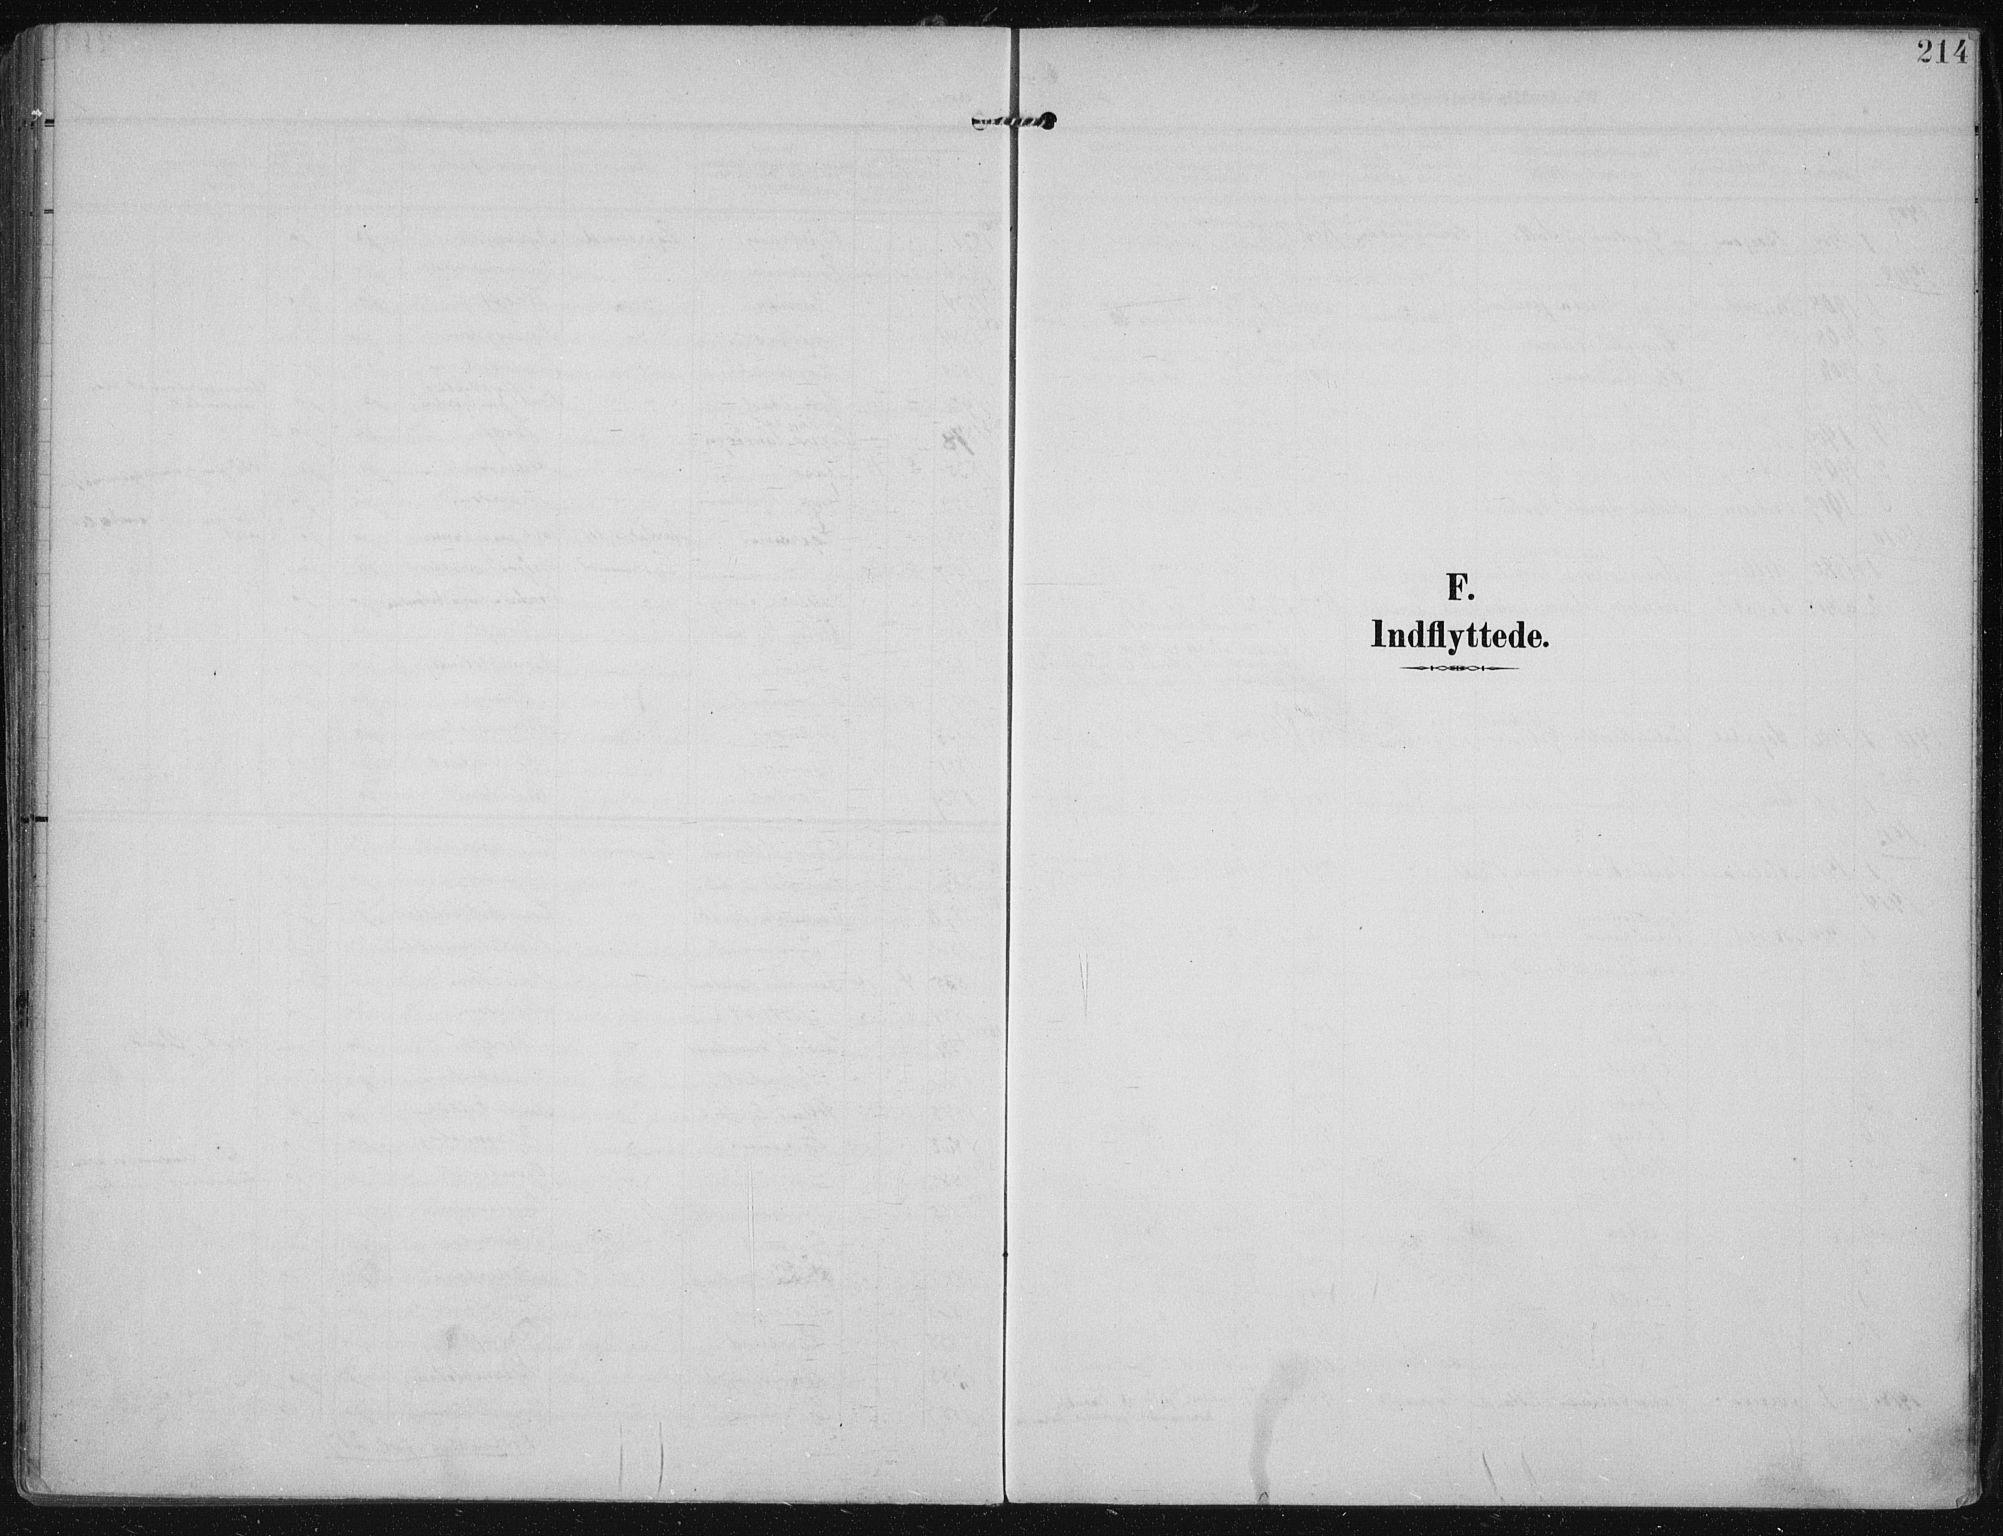 SAST, Egersund sokneprestkontor, Ministerialbok nr. A 21, 1905-1928, s. 214